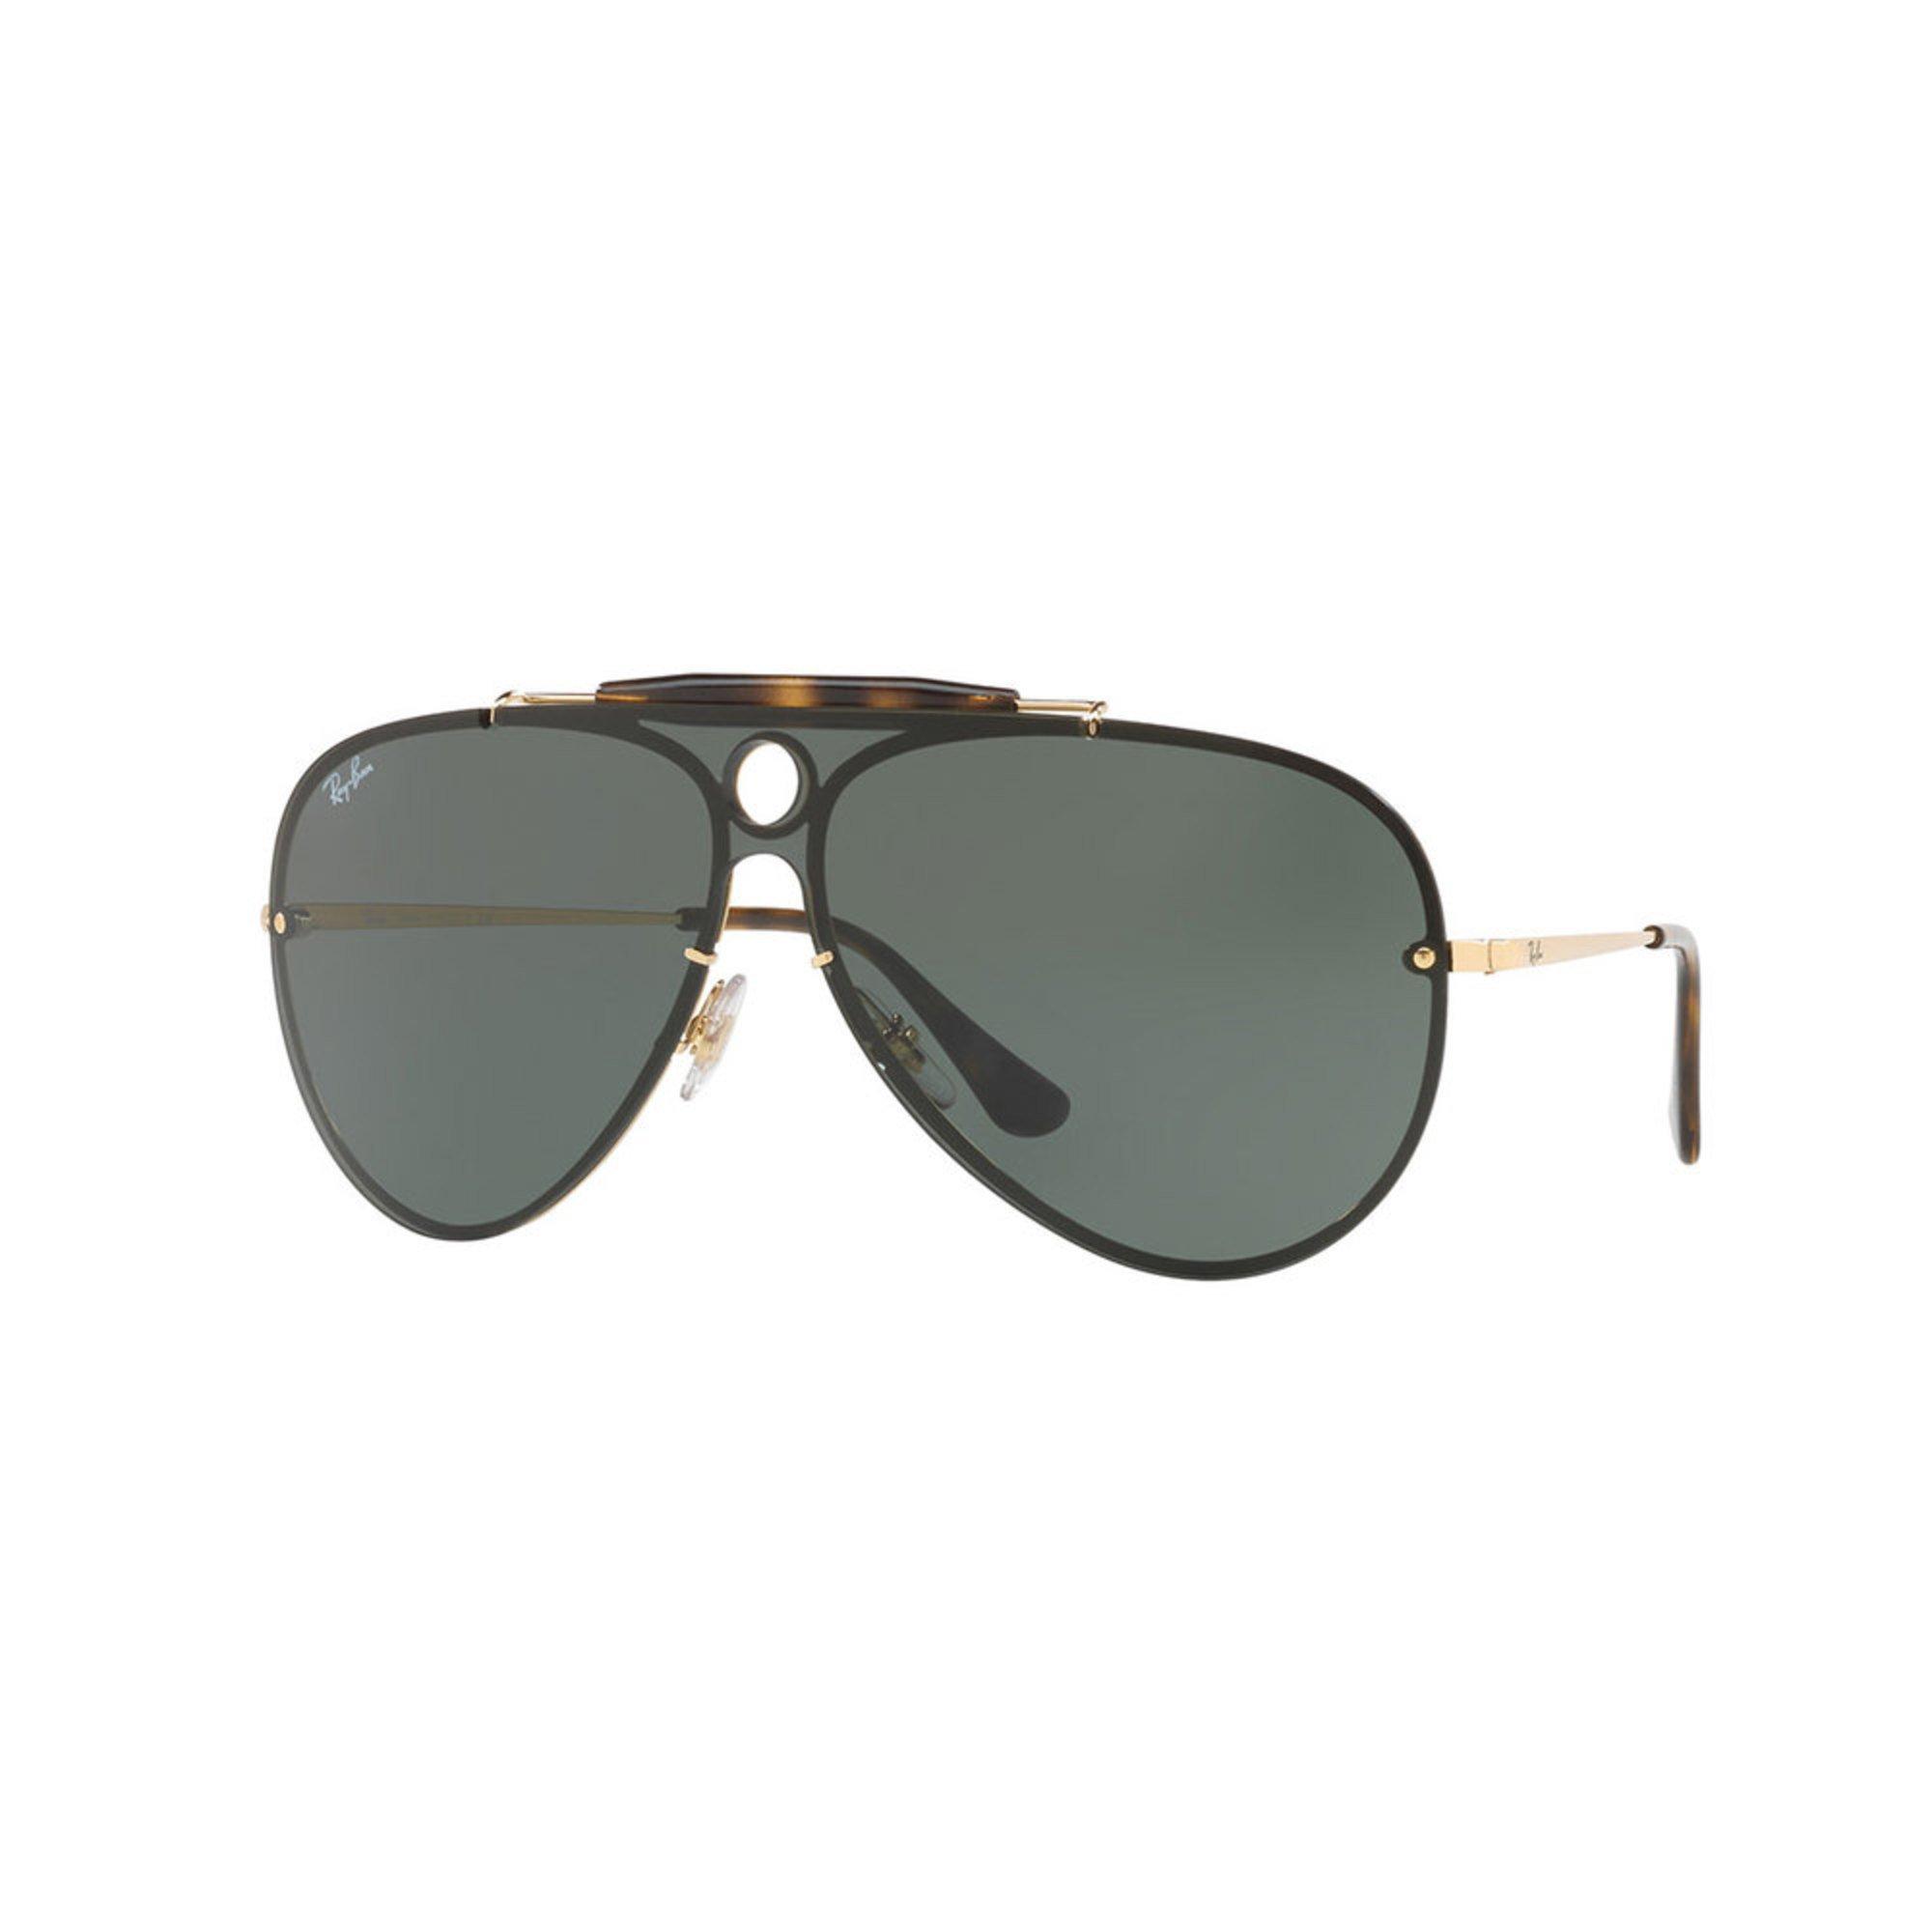 09578ed352765 Ray-ban Unisex Aviator Sunglasses